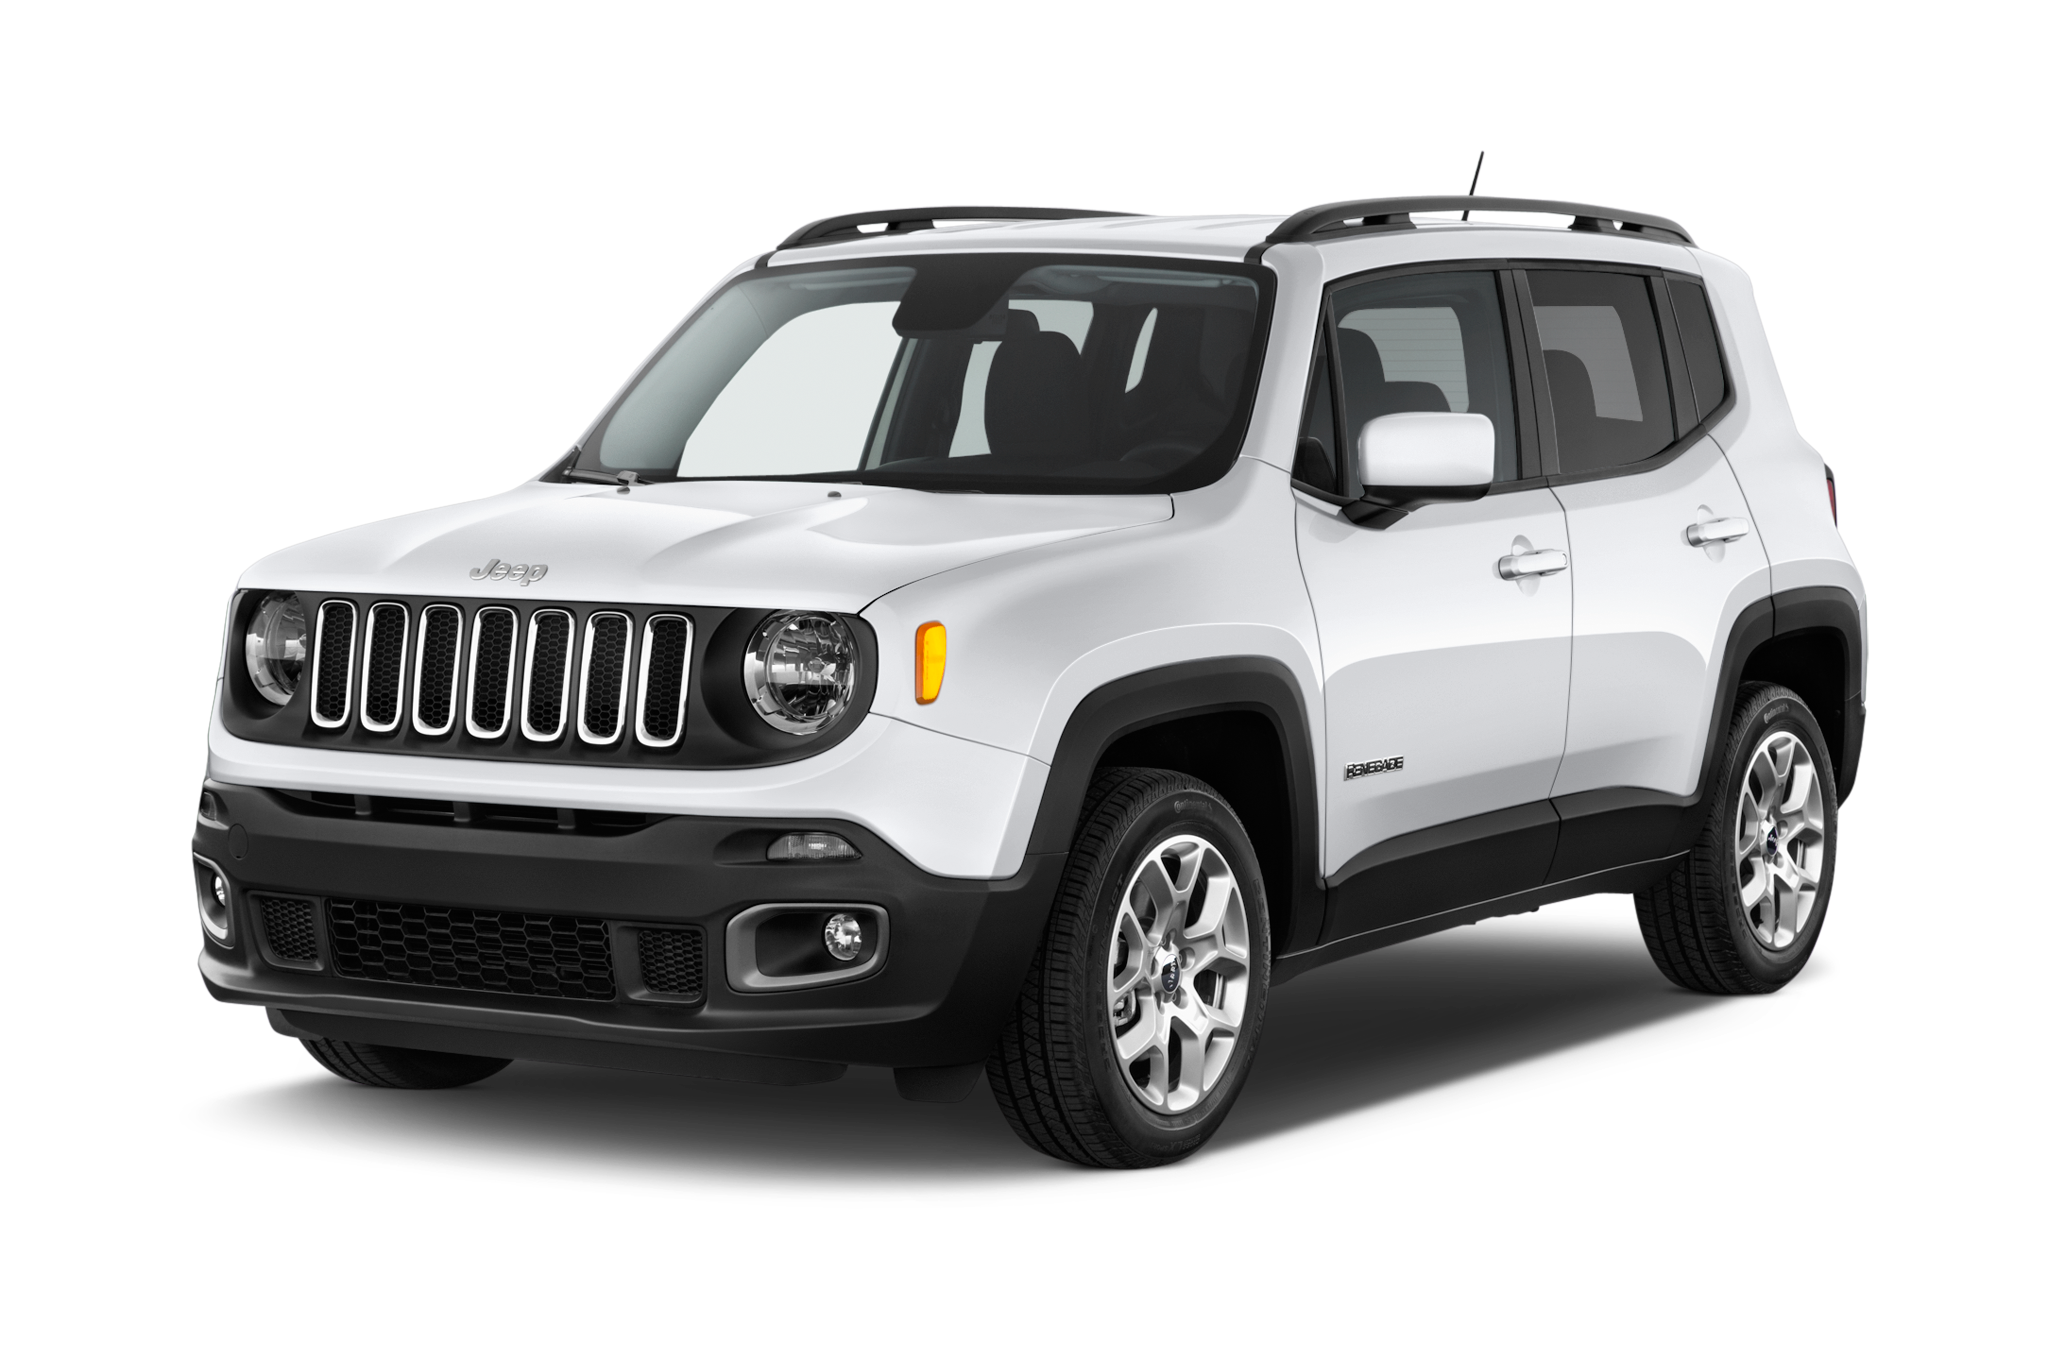 2017 Jeep Renegade Reviews.